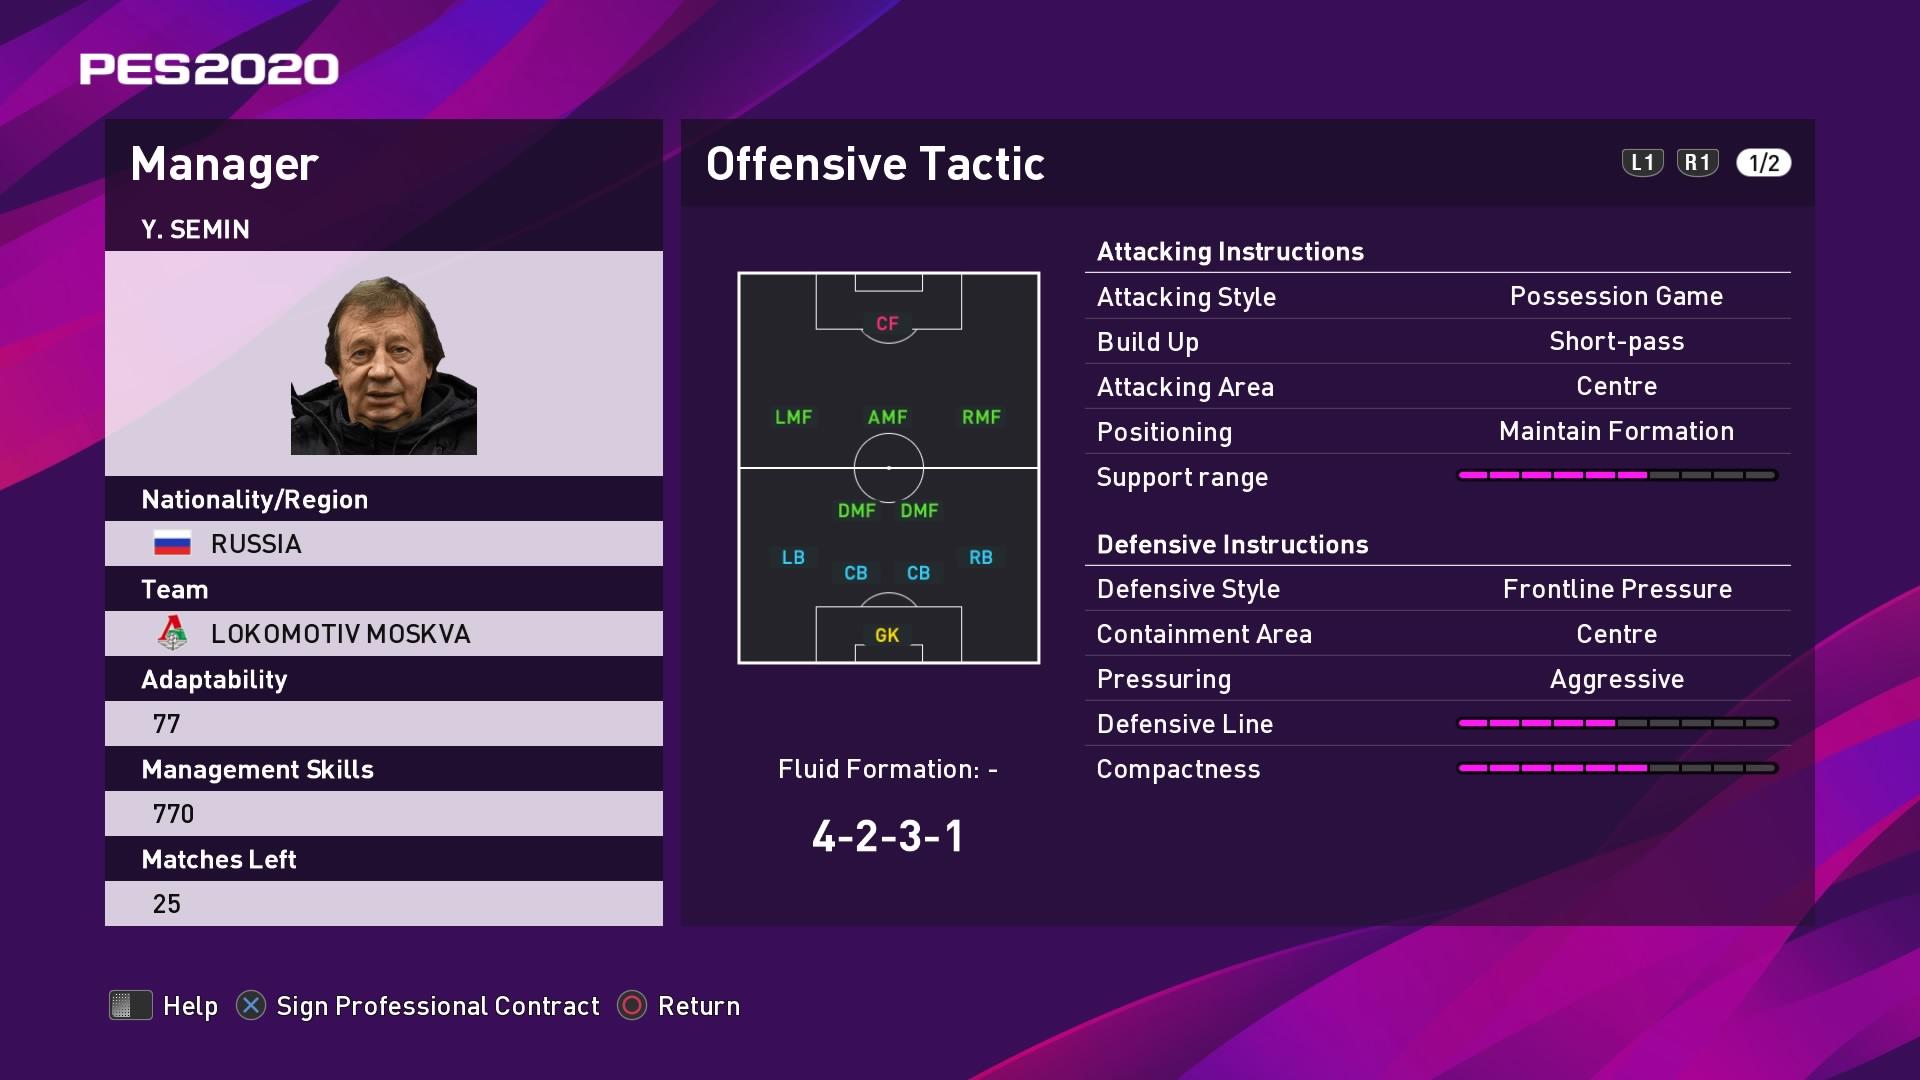 Y. Semin (3) (Yuri Semin) Offensive Tactic in PES 2020 myClub